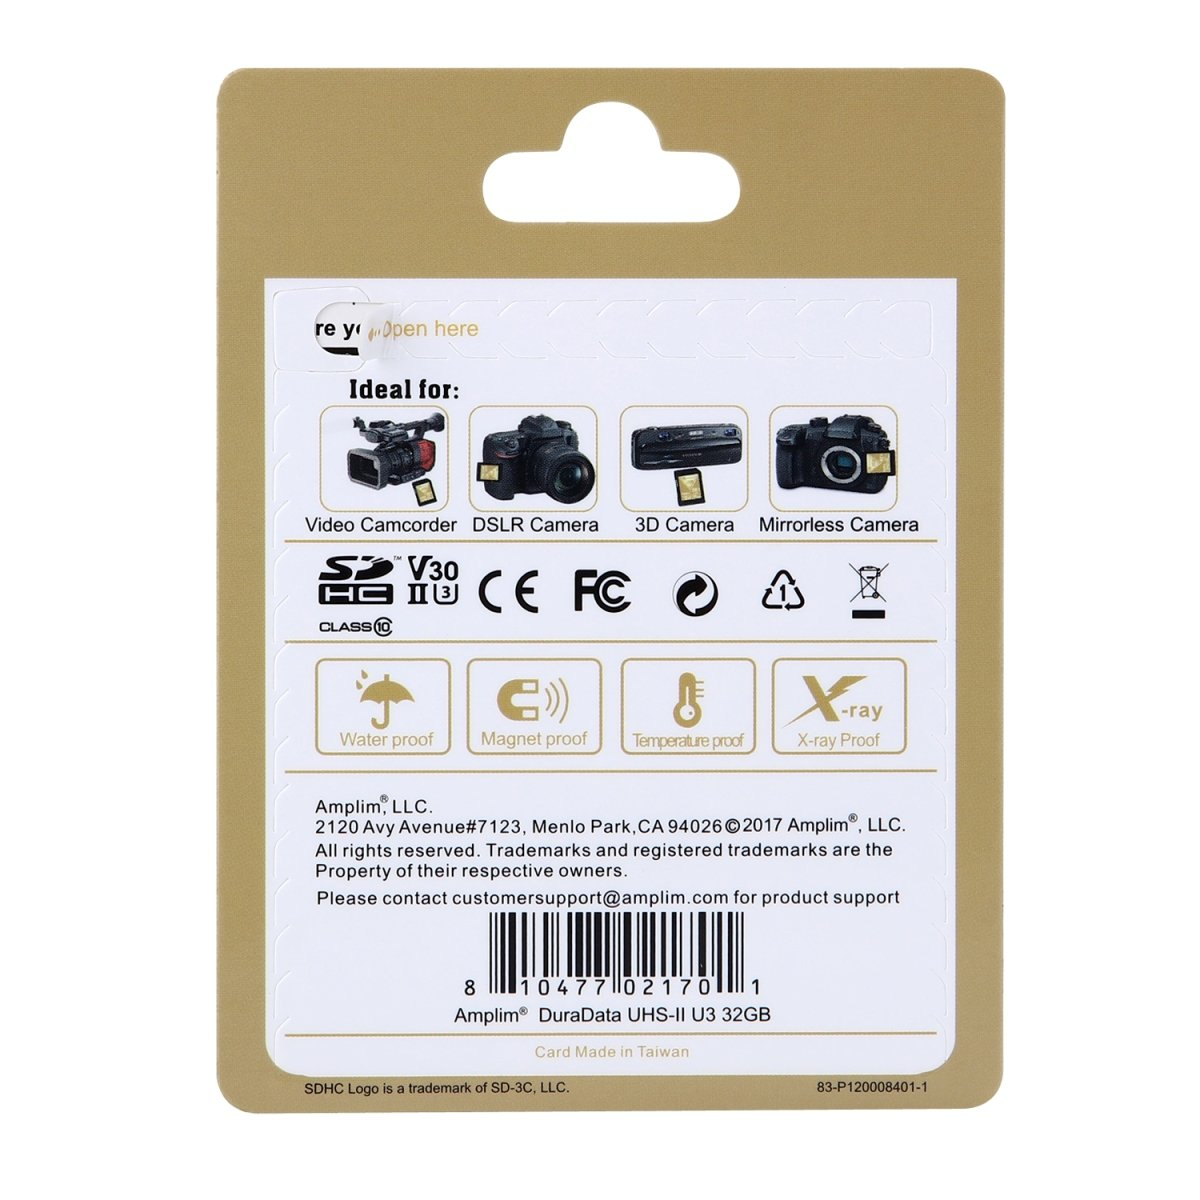 Amplim 32GB UHS-II SDHC SD Card Blazing Fast Read 285MB/S (1900X) Class 10 U3 Ultra High Speed V30 UHSII Extreme Pro SD HC Memory Card. Professional 4K Full HD Video Shooting 32 GB/32G TF Flash. New by Amplim (Image #6)